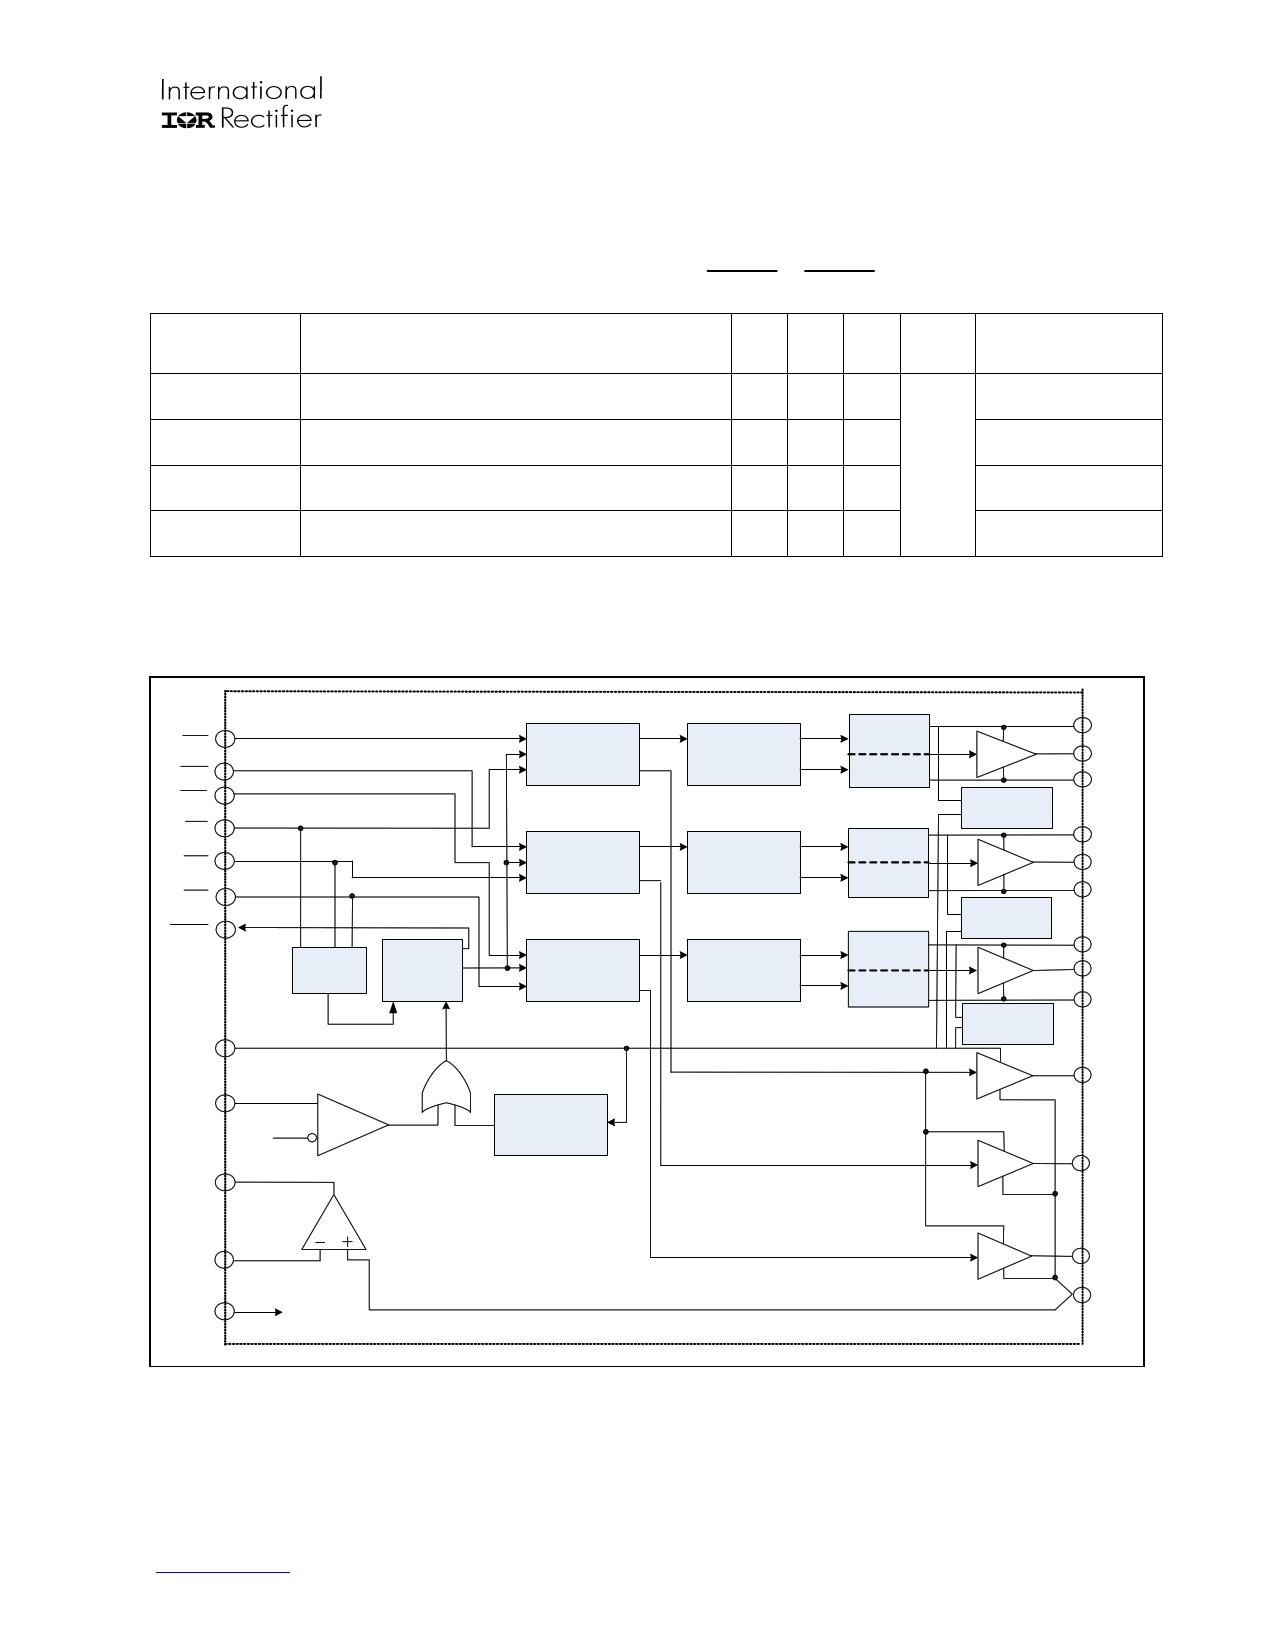 3 phase 5 pin socket wiring diagram s sun layers electrical three plug nz datasheet irs233jpbf bridge driver page pdf of